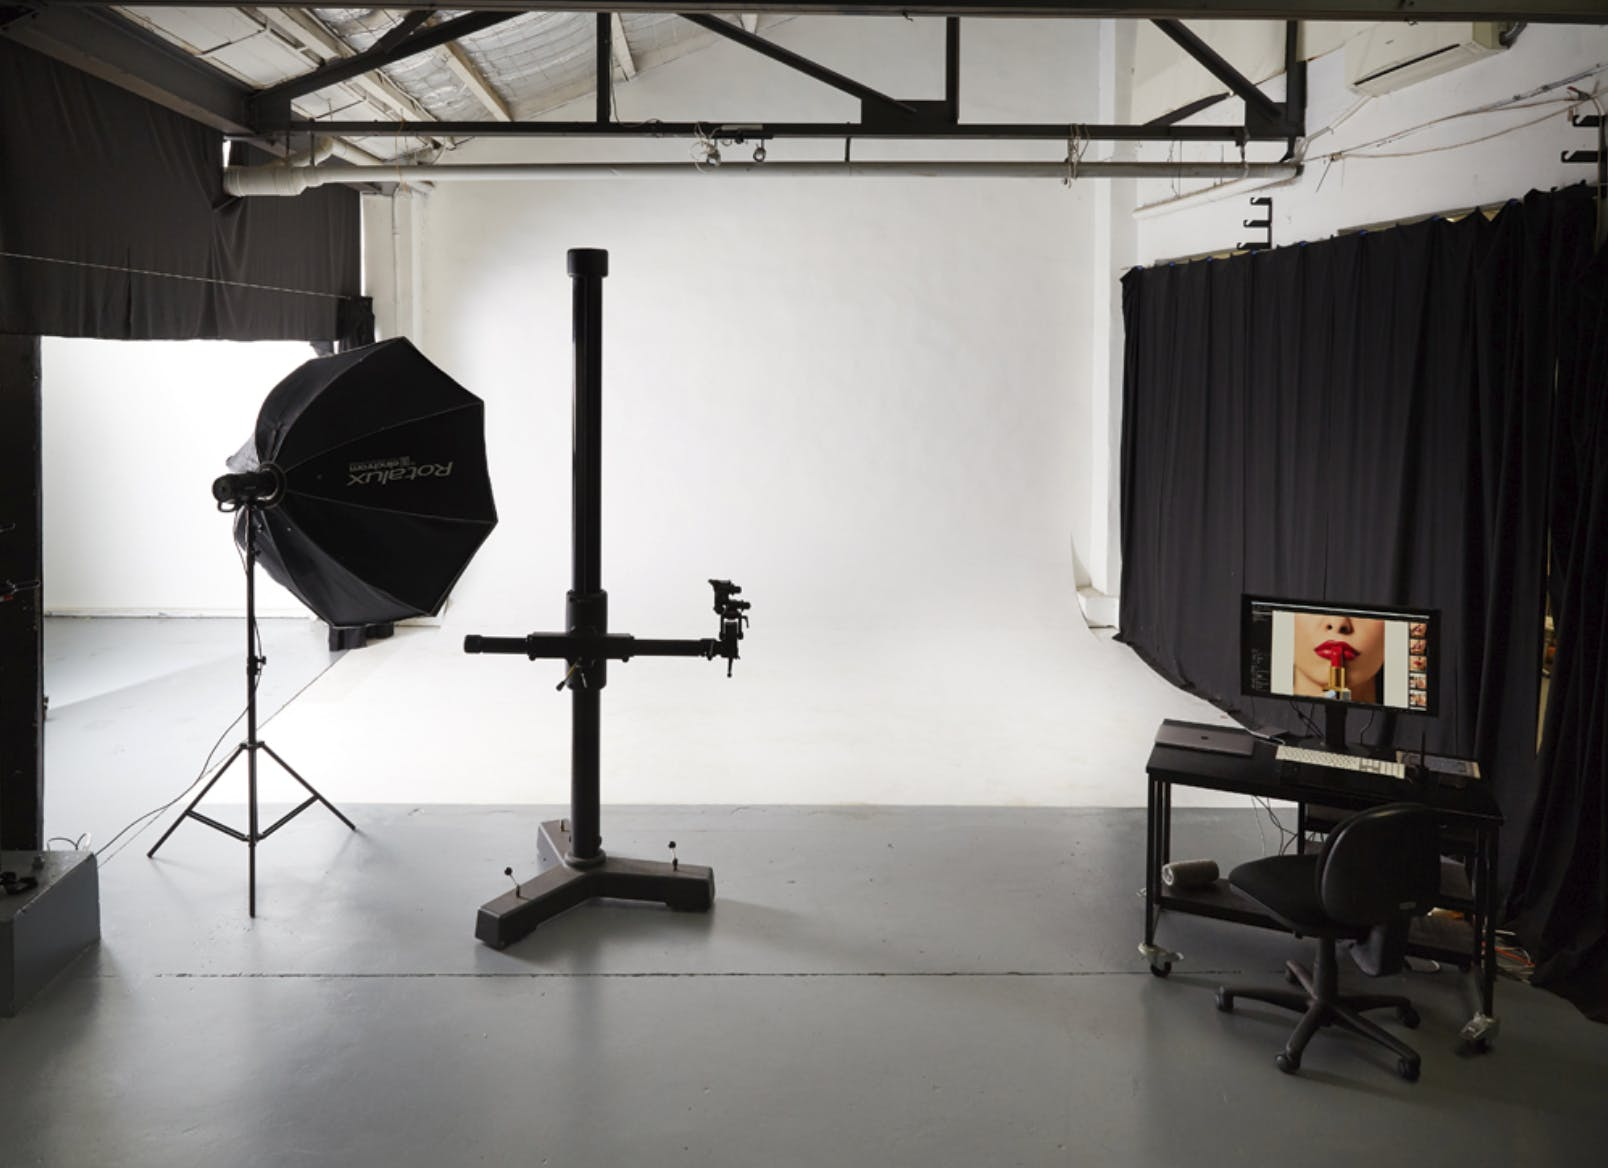 Cyclorama, creative studio at Studio 80, image 1